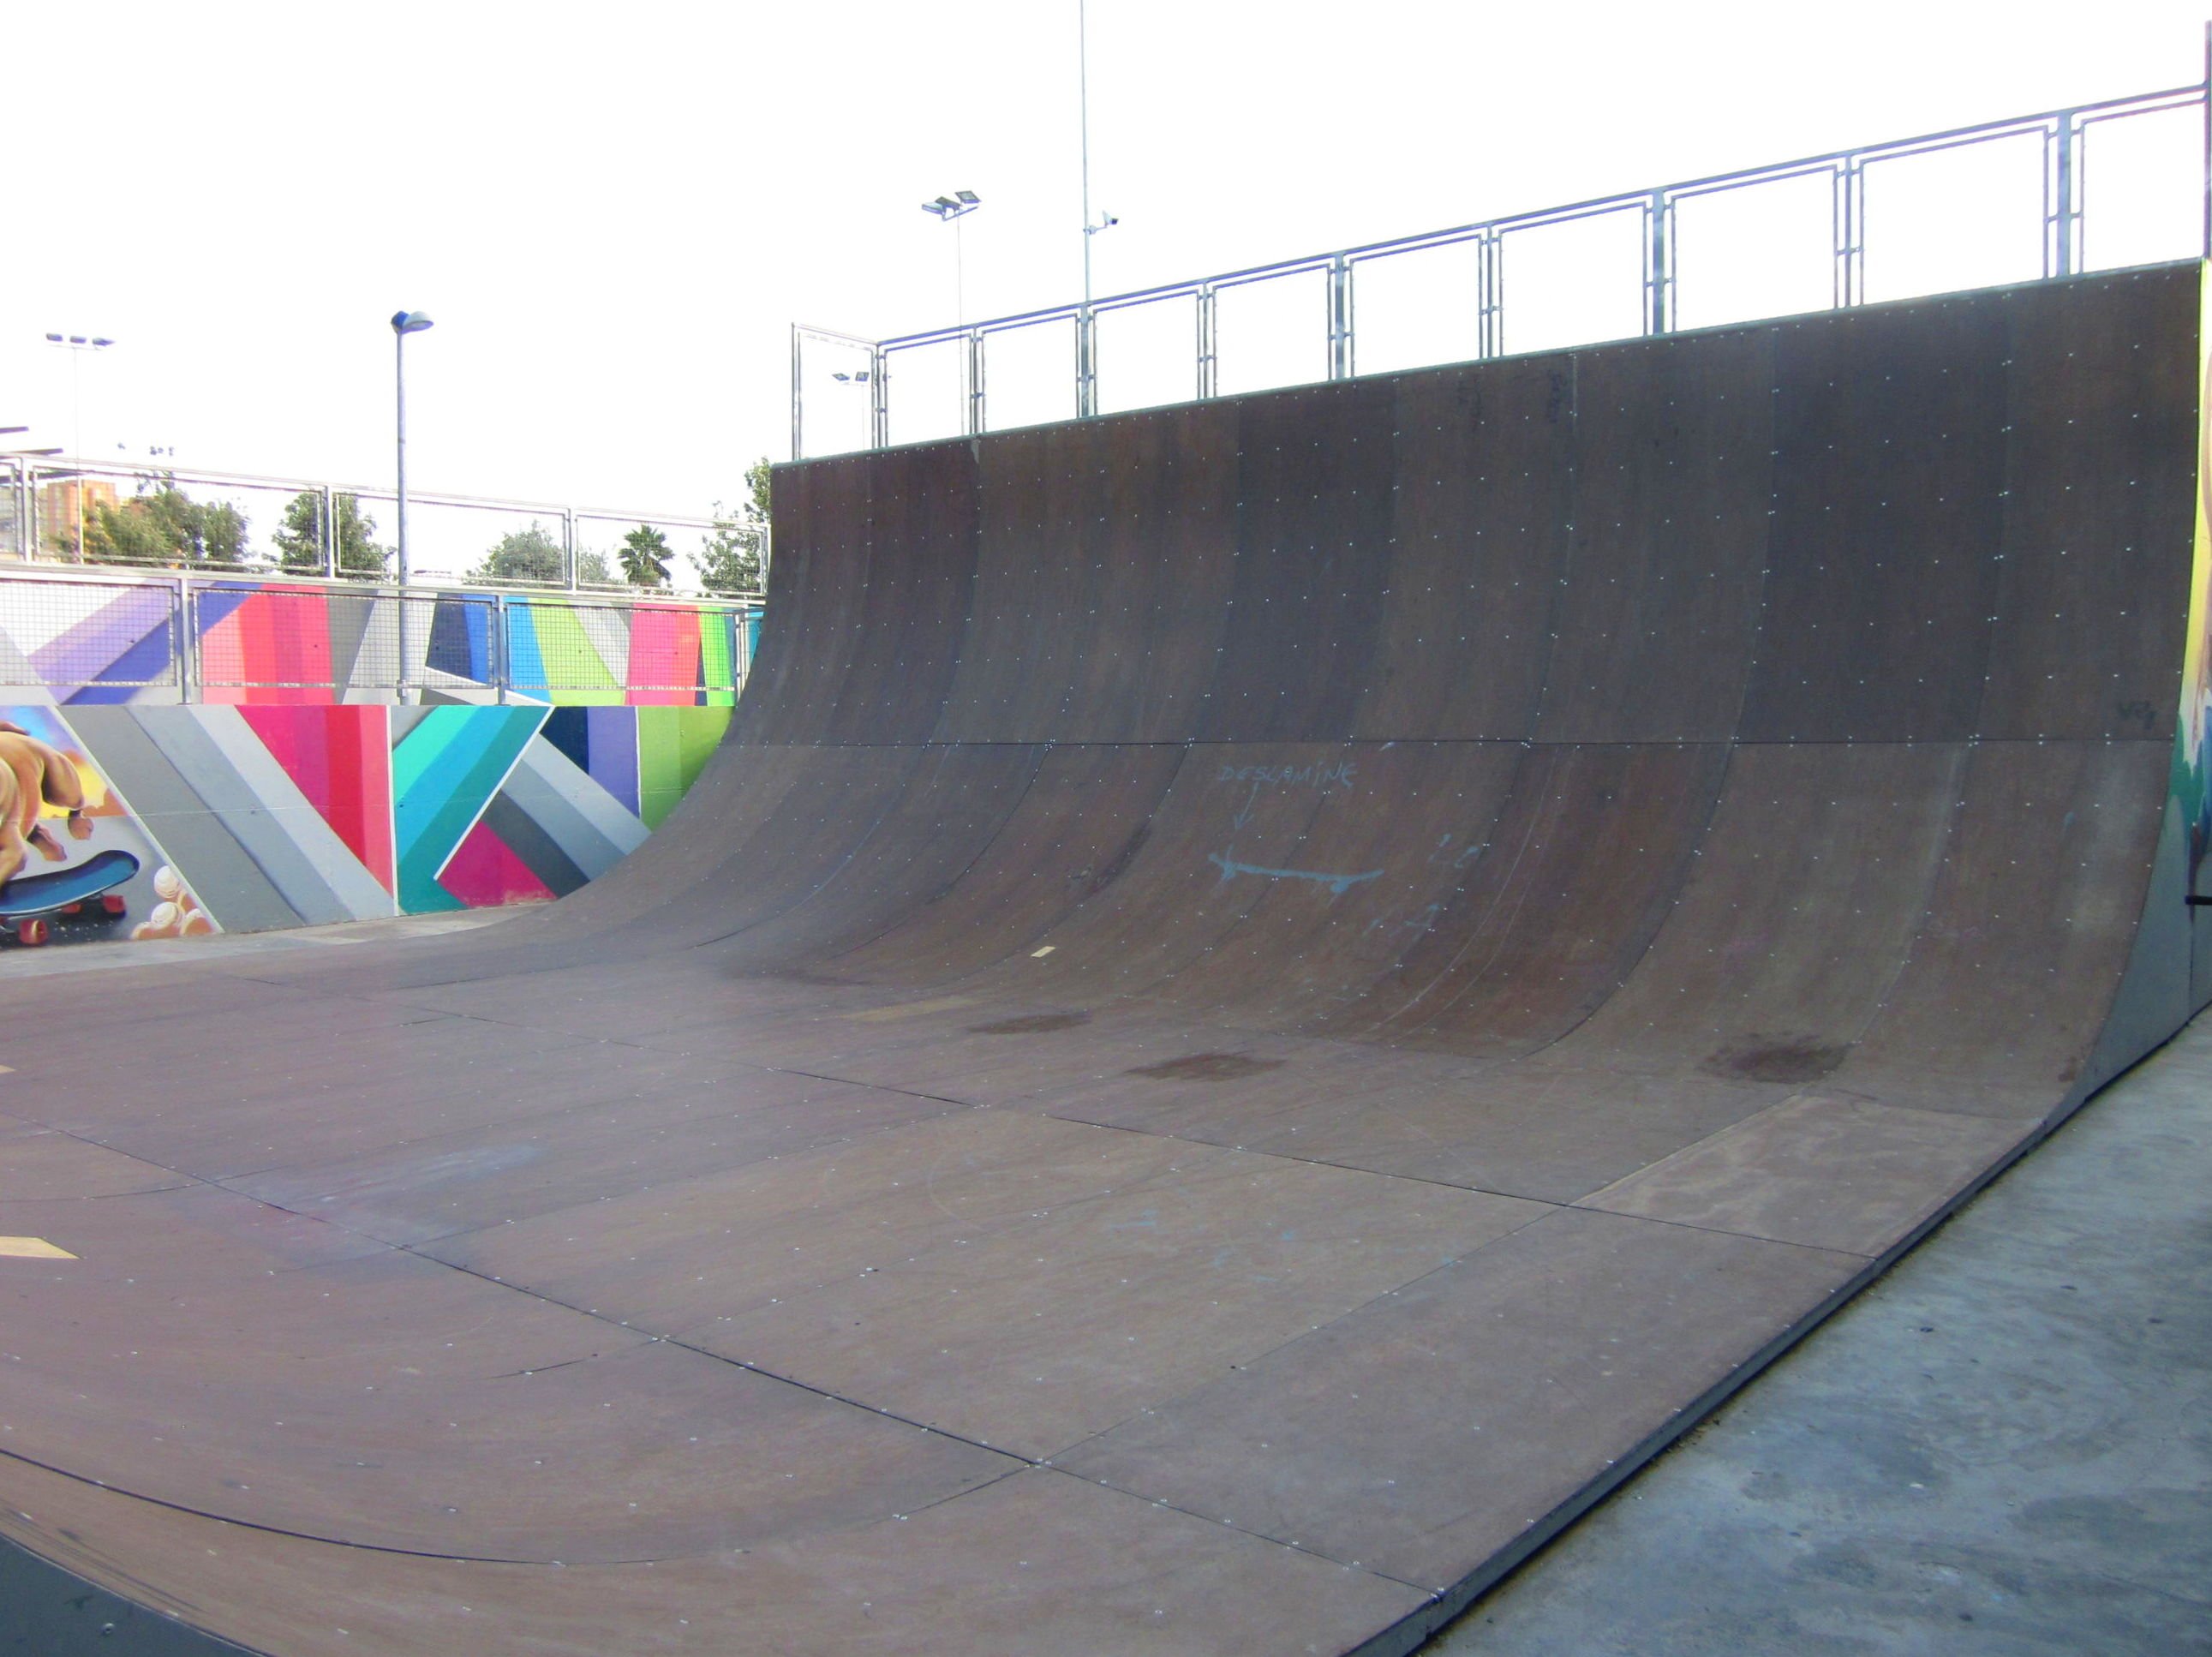 Foto 9 de Skate en Amorebieta | Transformers Skateparks